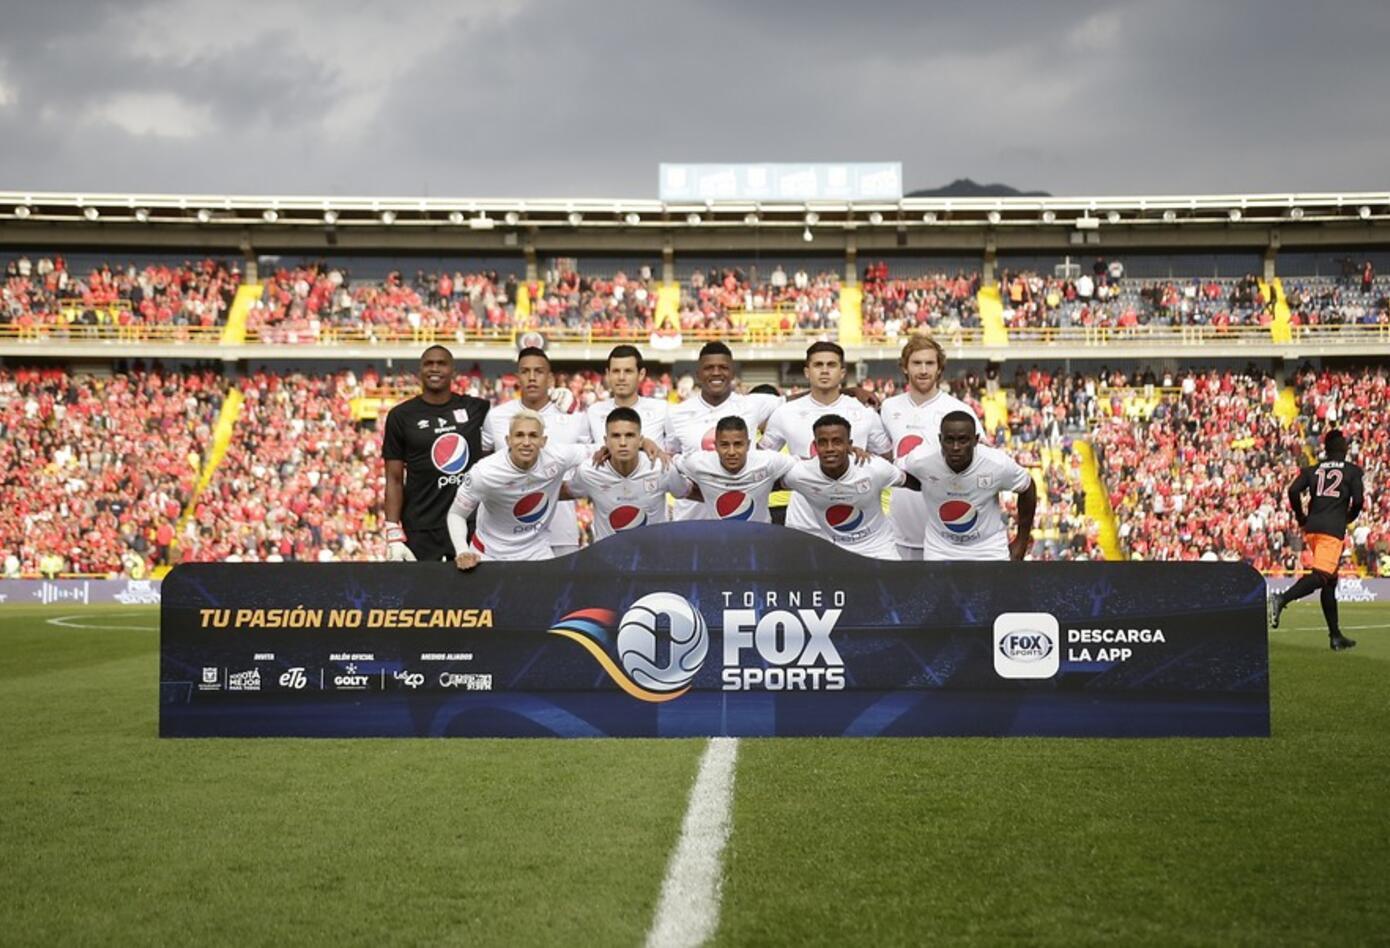 Santa Fe vs América - Torneo Fox Sports 2019